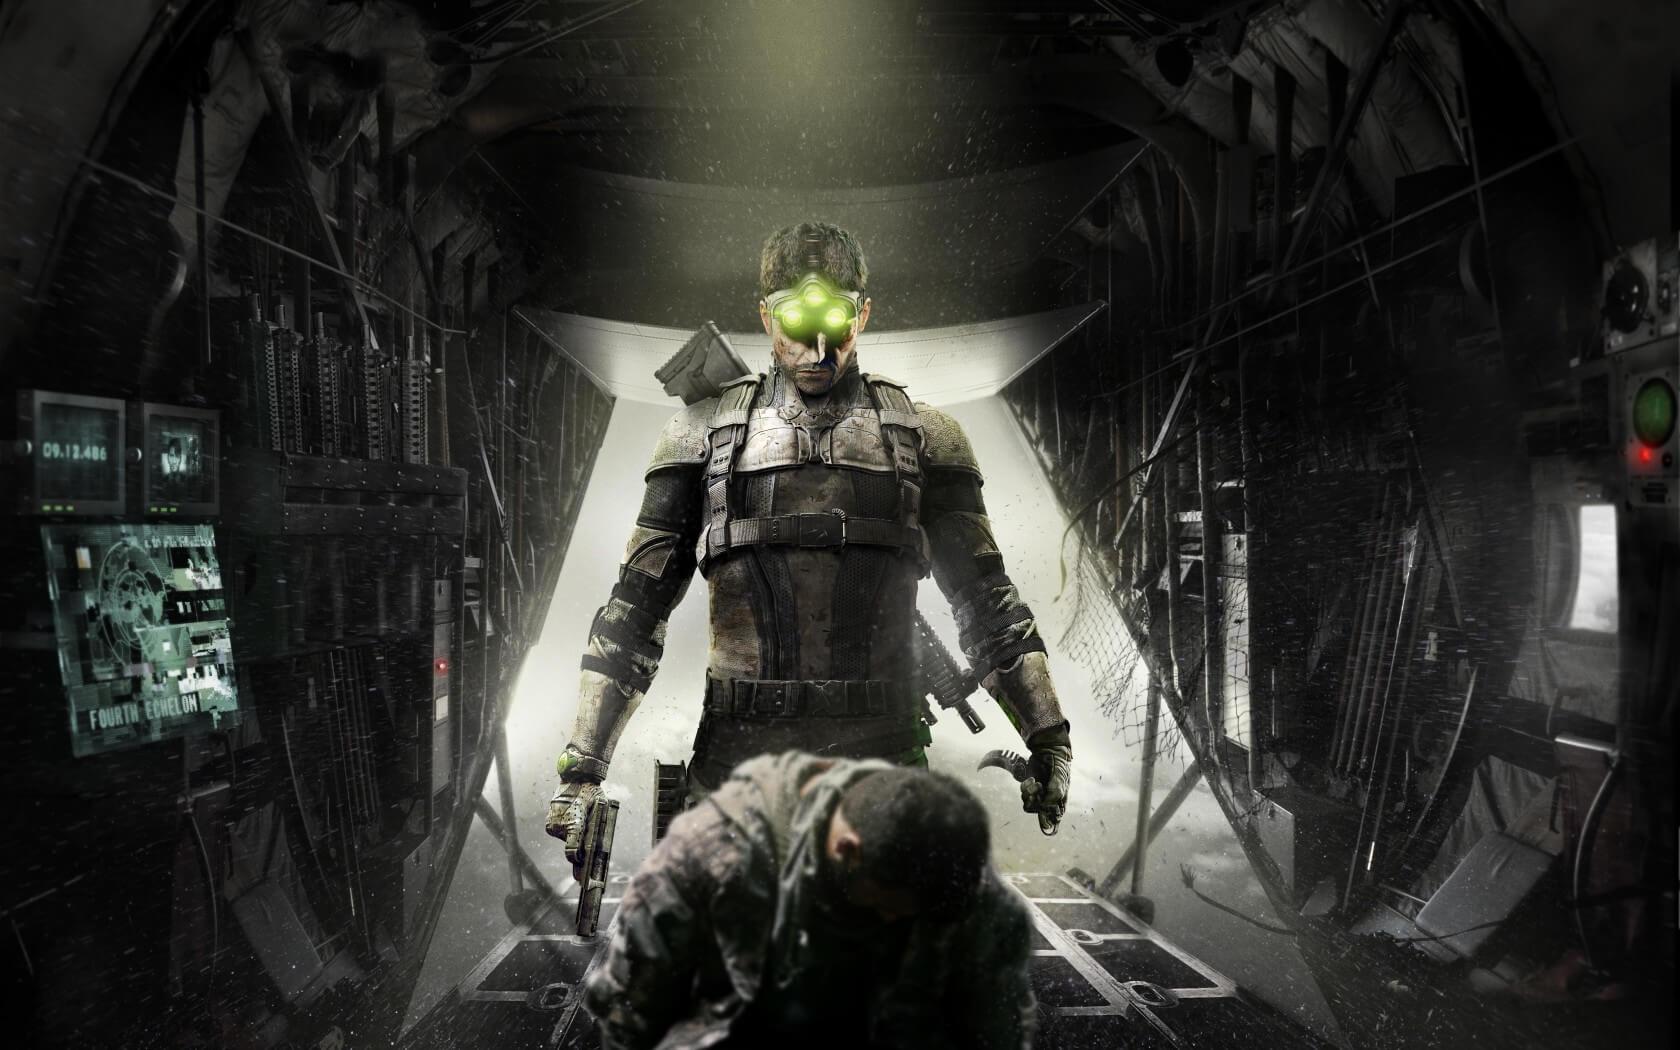 'Splinter Cell Blacklist' Hands-On Preview